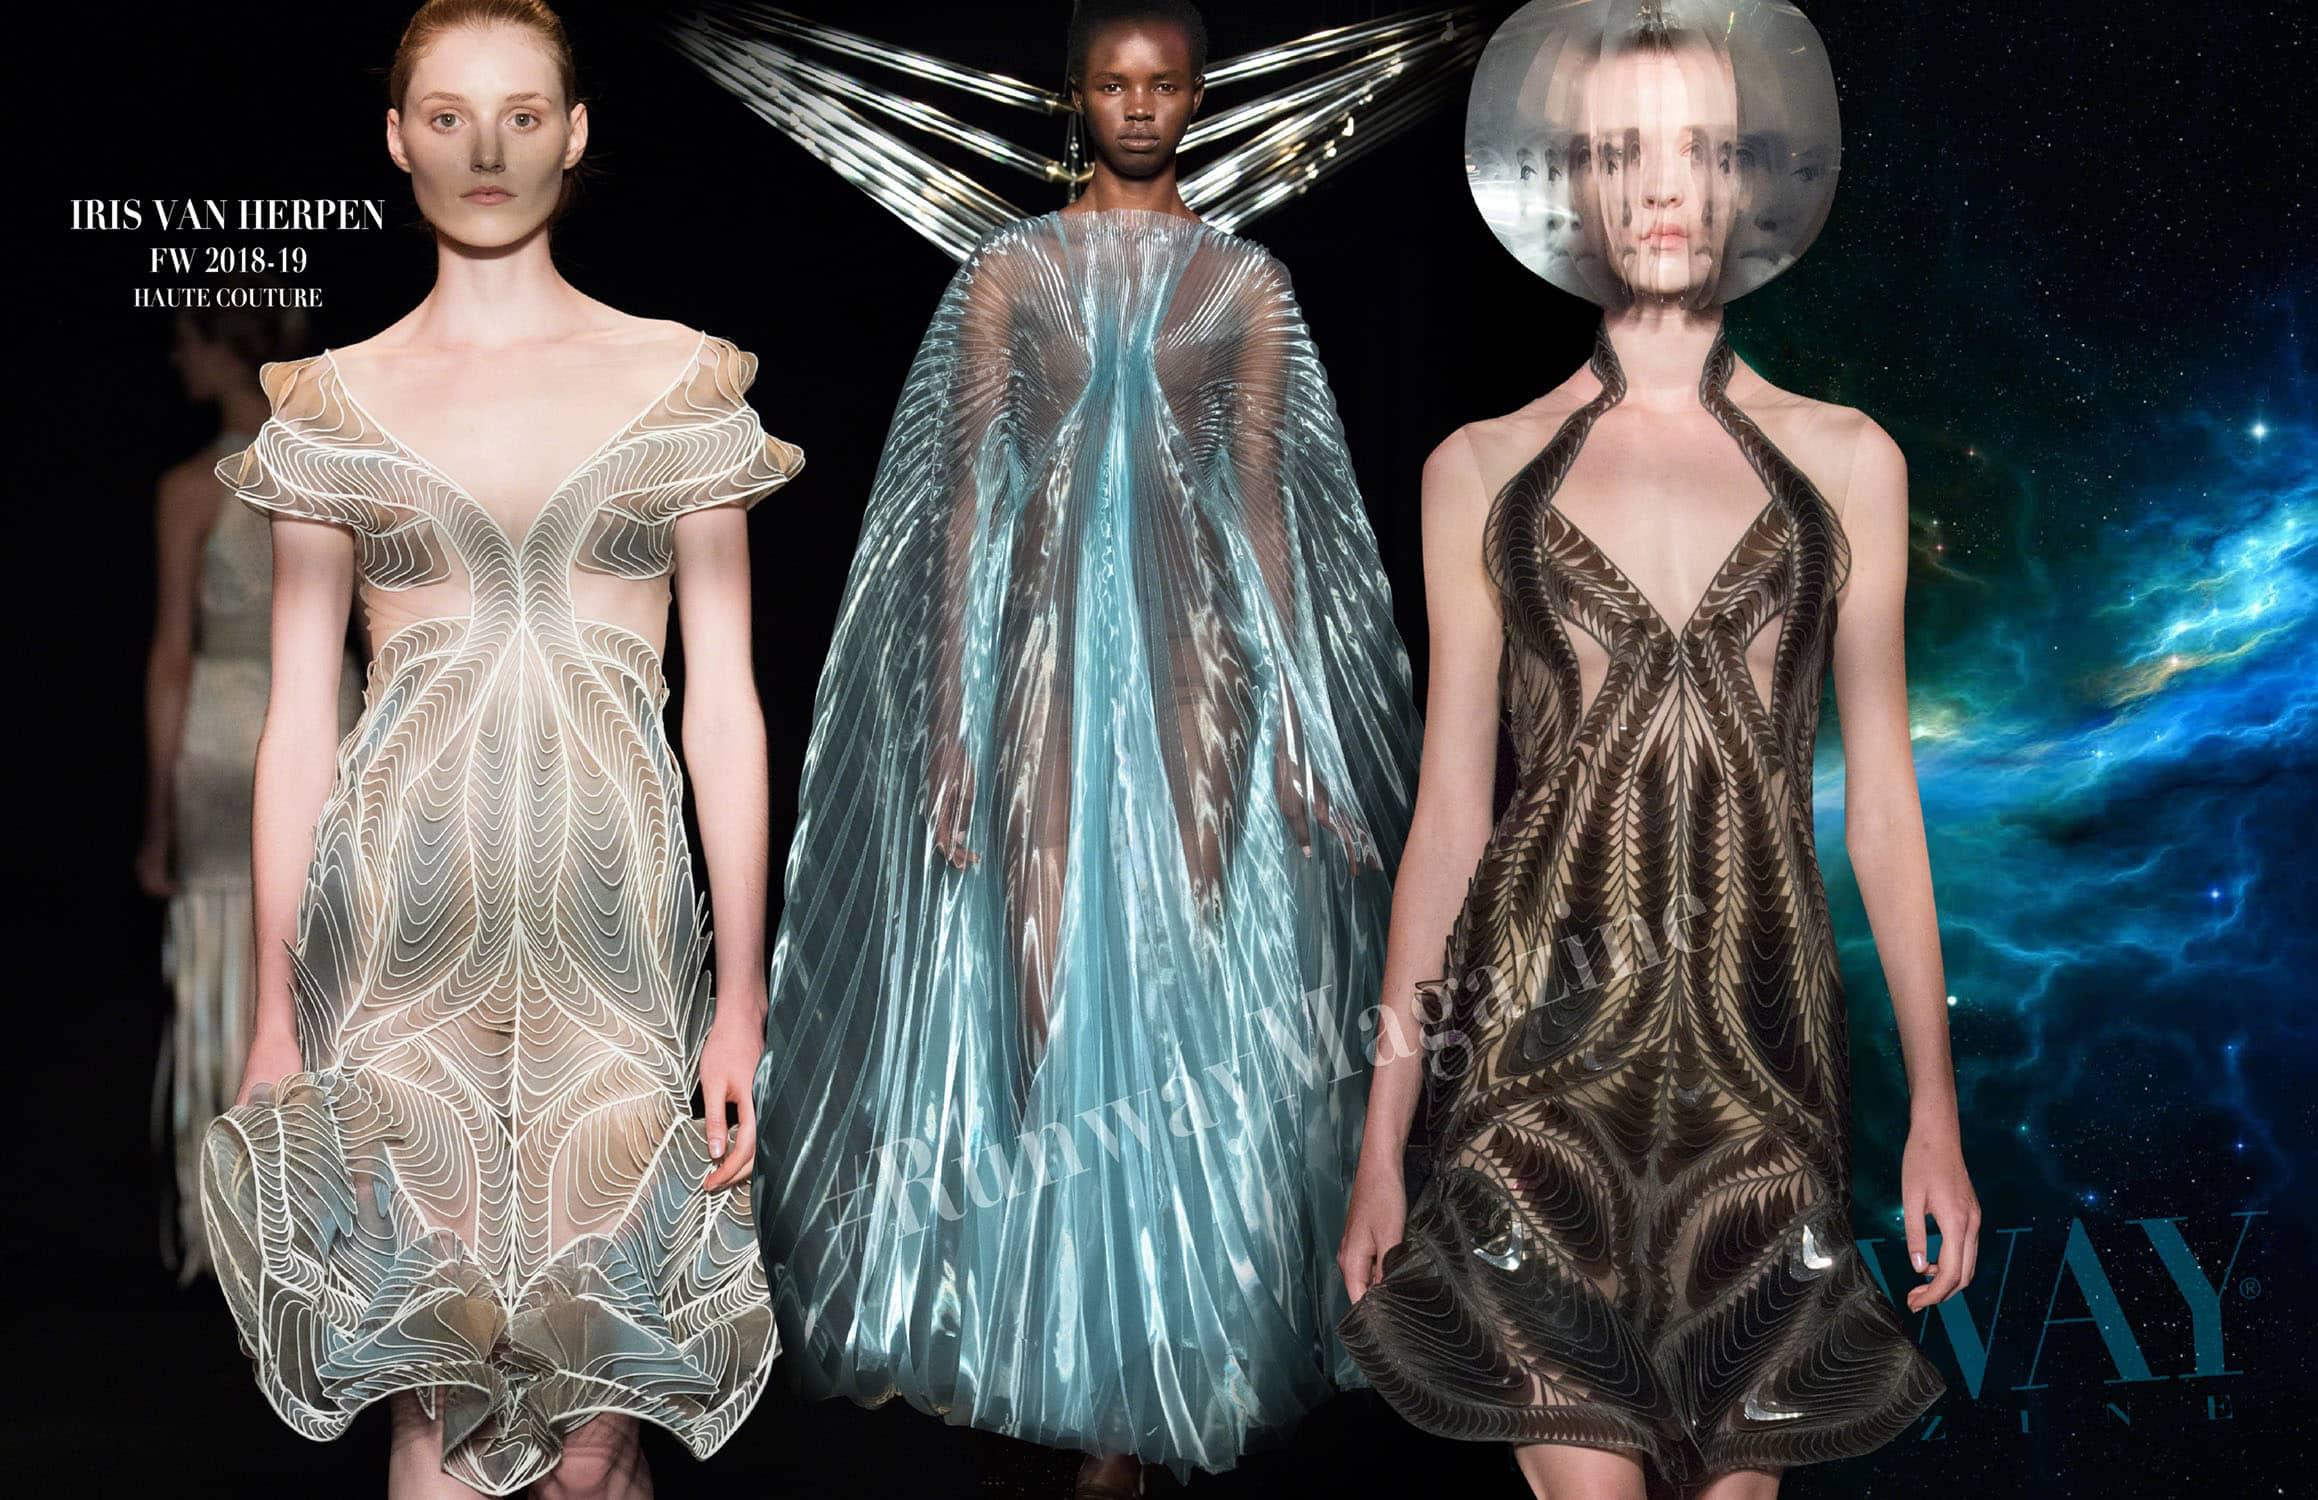 Iris van Herpen Haute Couture Fall-Winter 2018-19 Paris Fashion Week by RUNWAY MAGAZINE